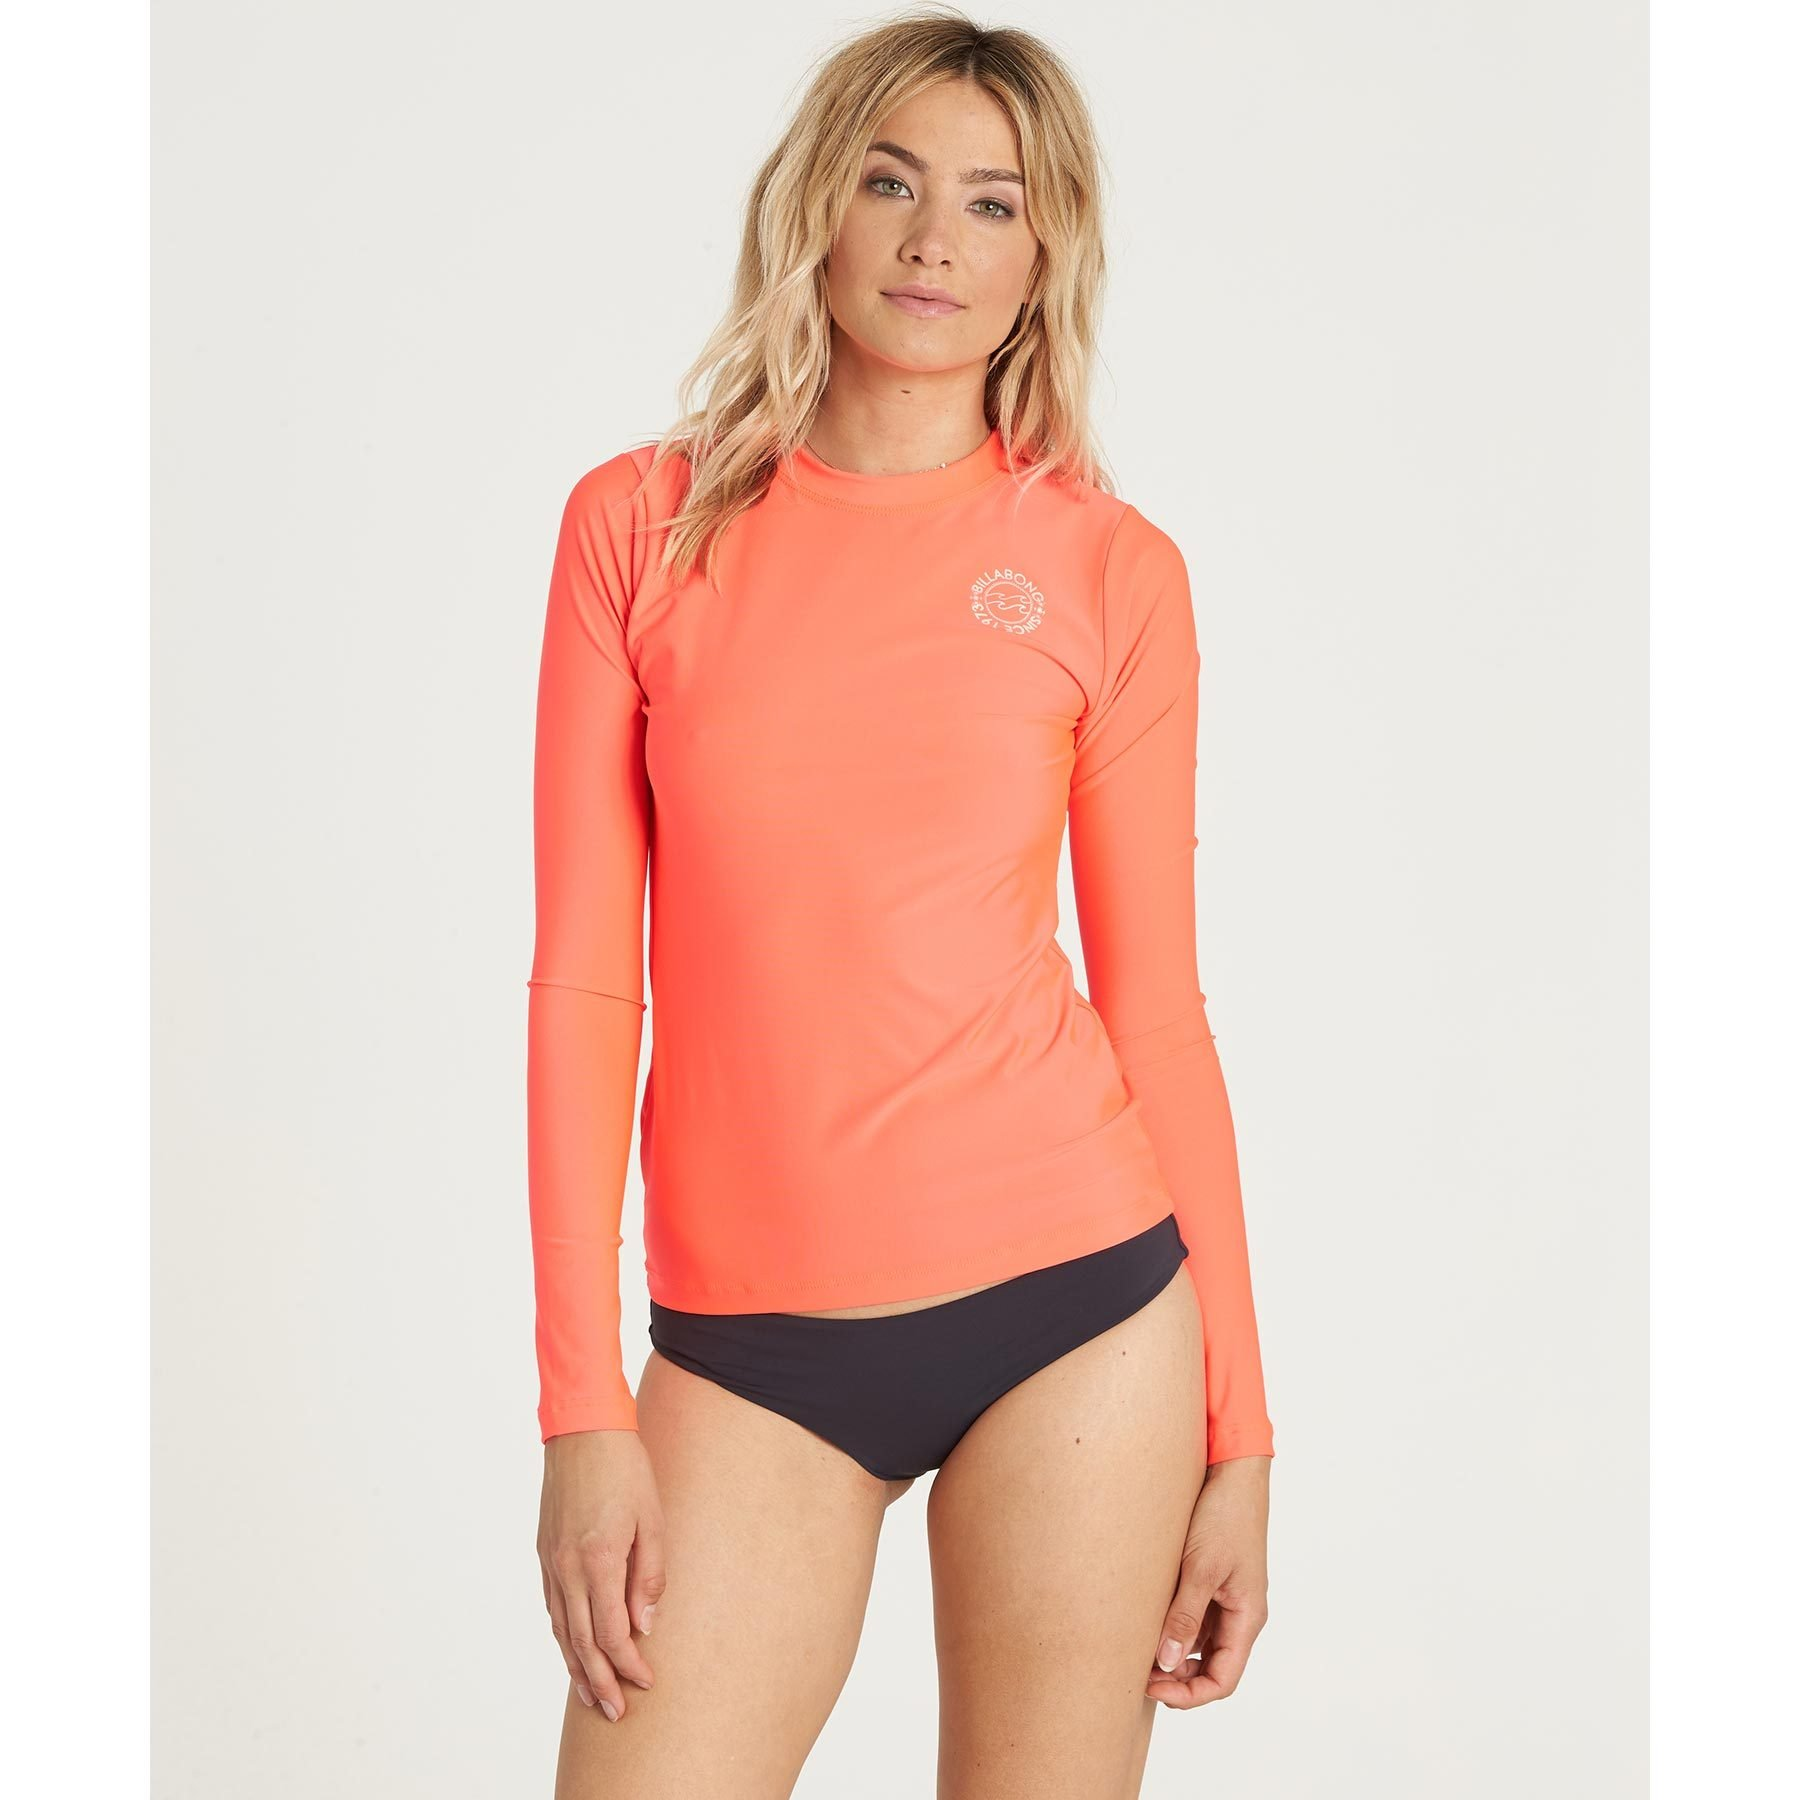 Billabong Women's Core Lose Fit Long-Sleeve Swim Rashguard, Horizon Red, S